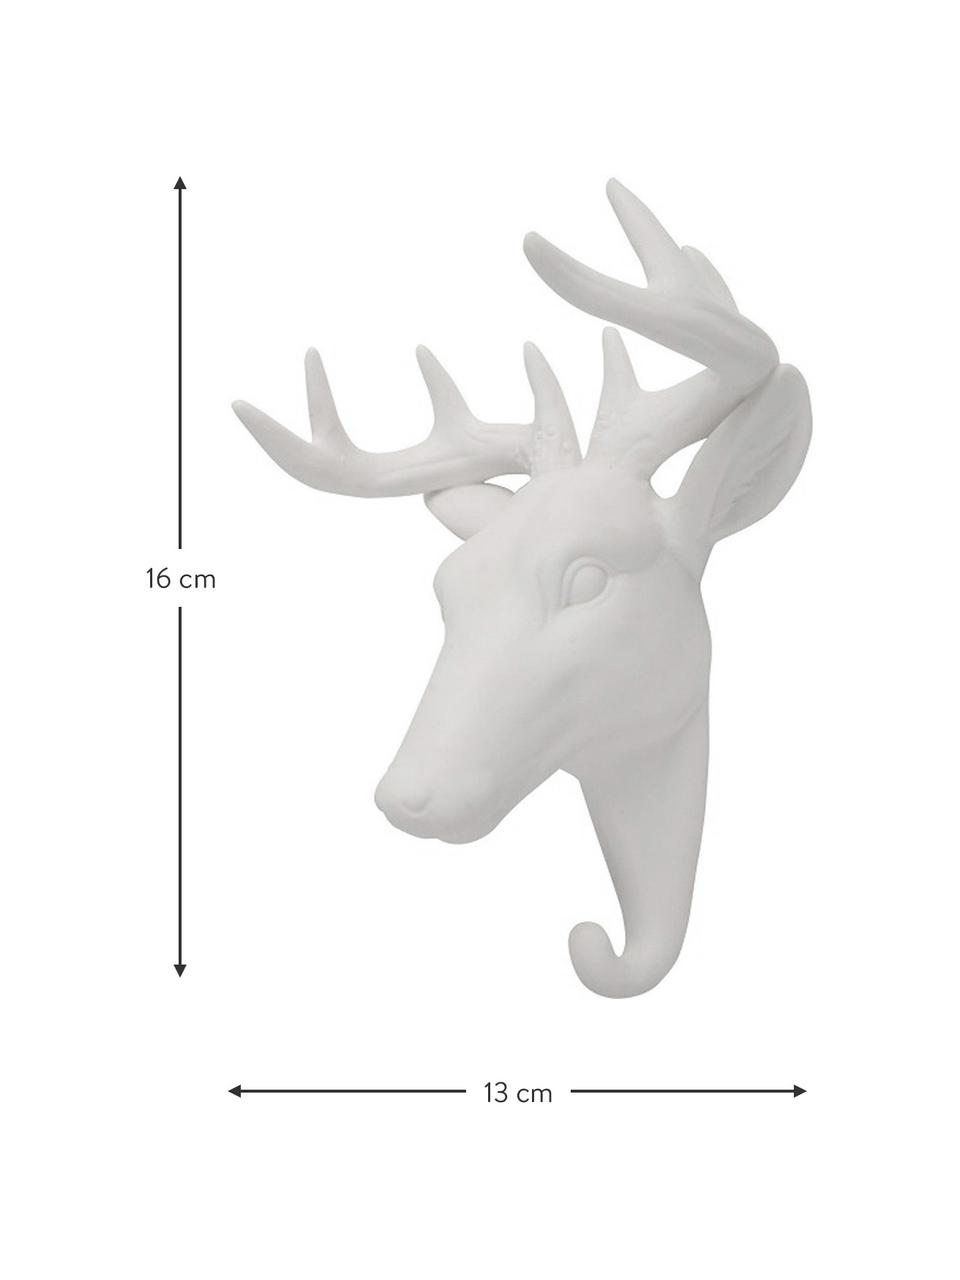 Wandhaken Deer aus Porzellan, Porzellan, Weiß, H 16 cm